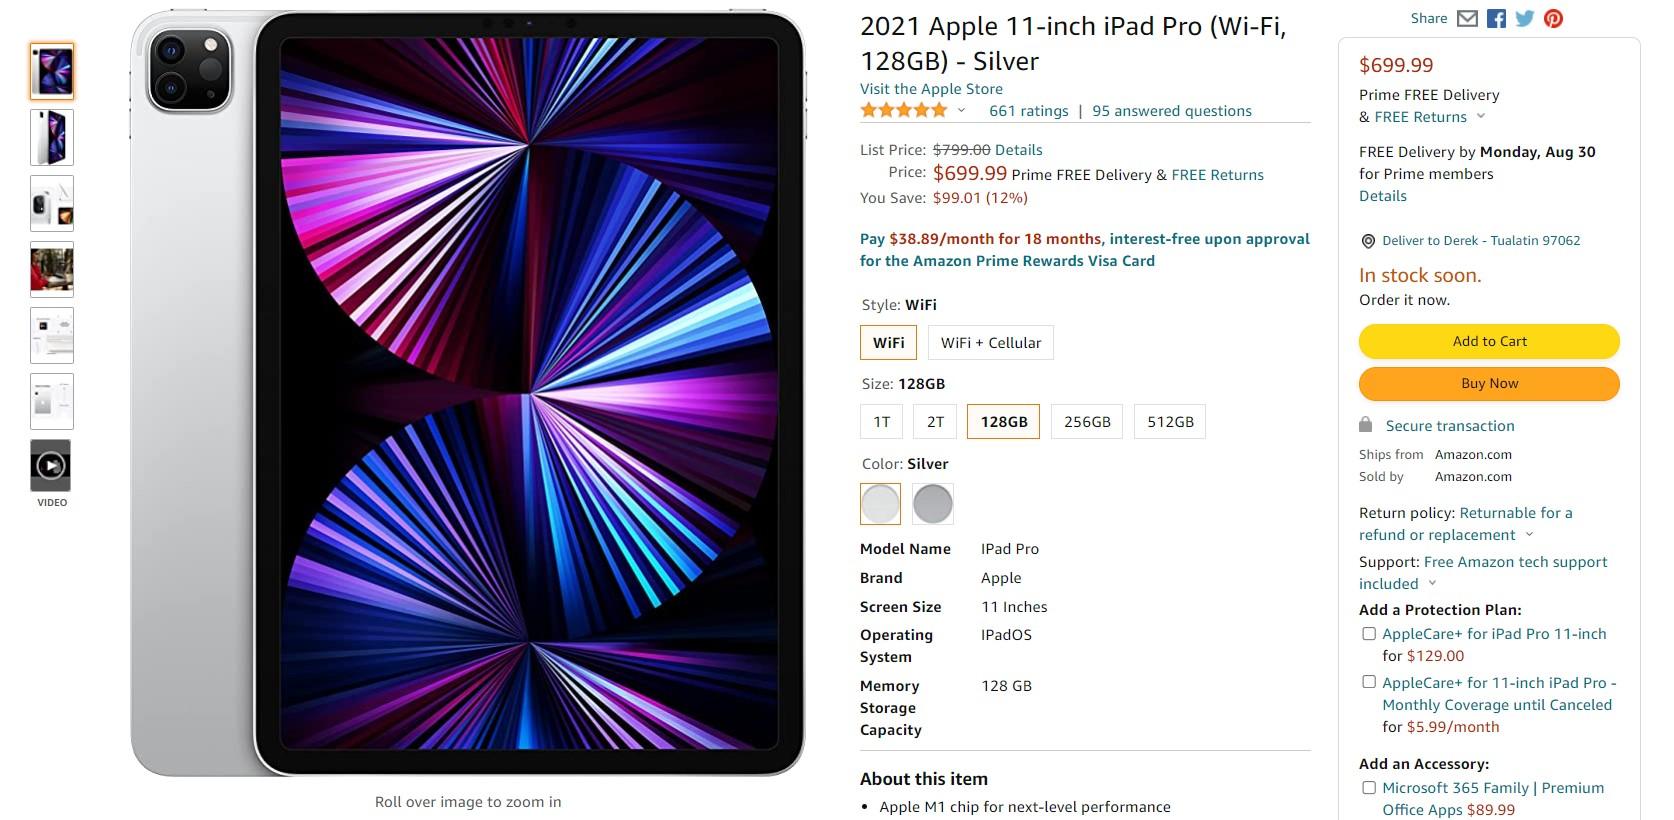 2021 Apple 11 inch iPad Pro Amazon Deal